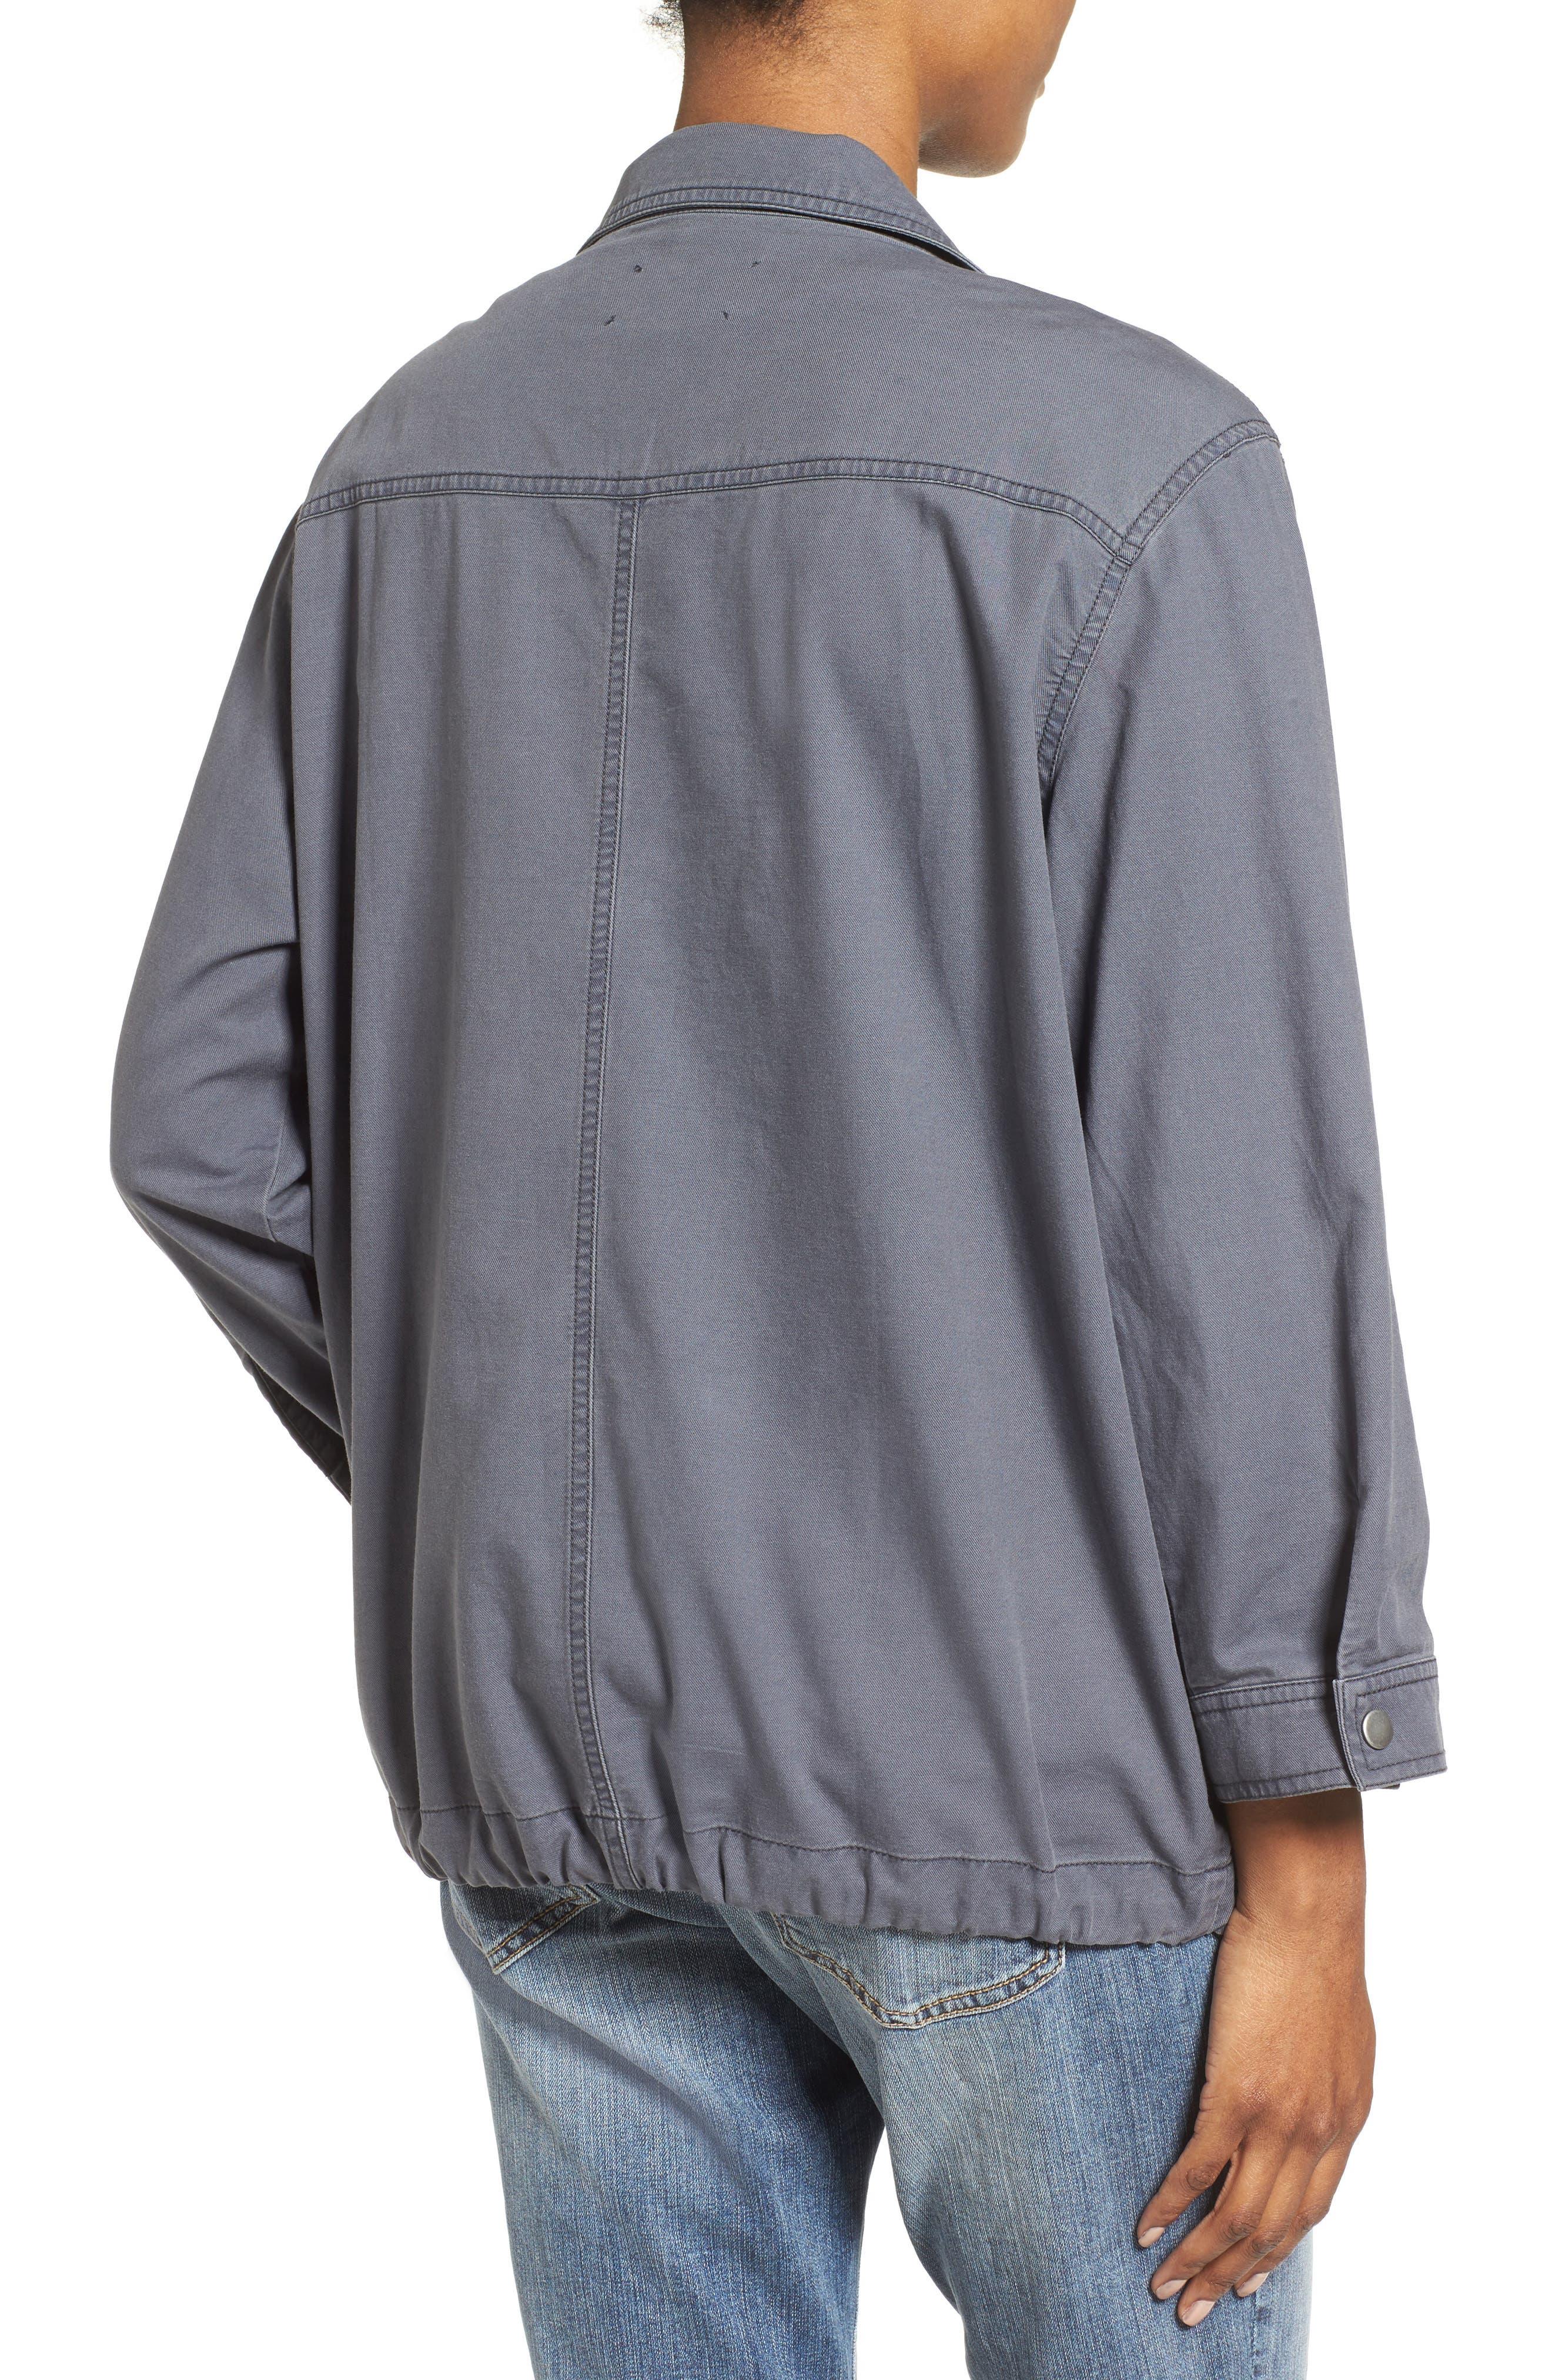 Roll Sleeve Utility Jacket,                             Alternate thumbnail 2, color,                             030